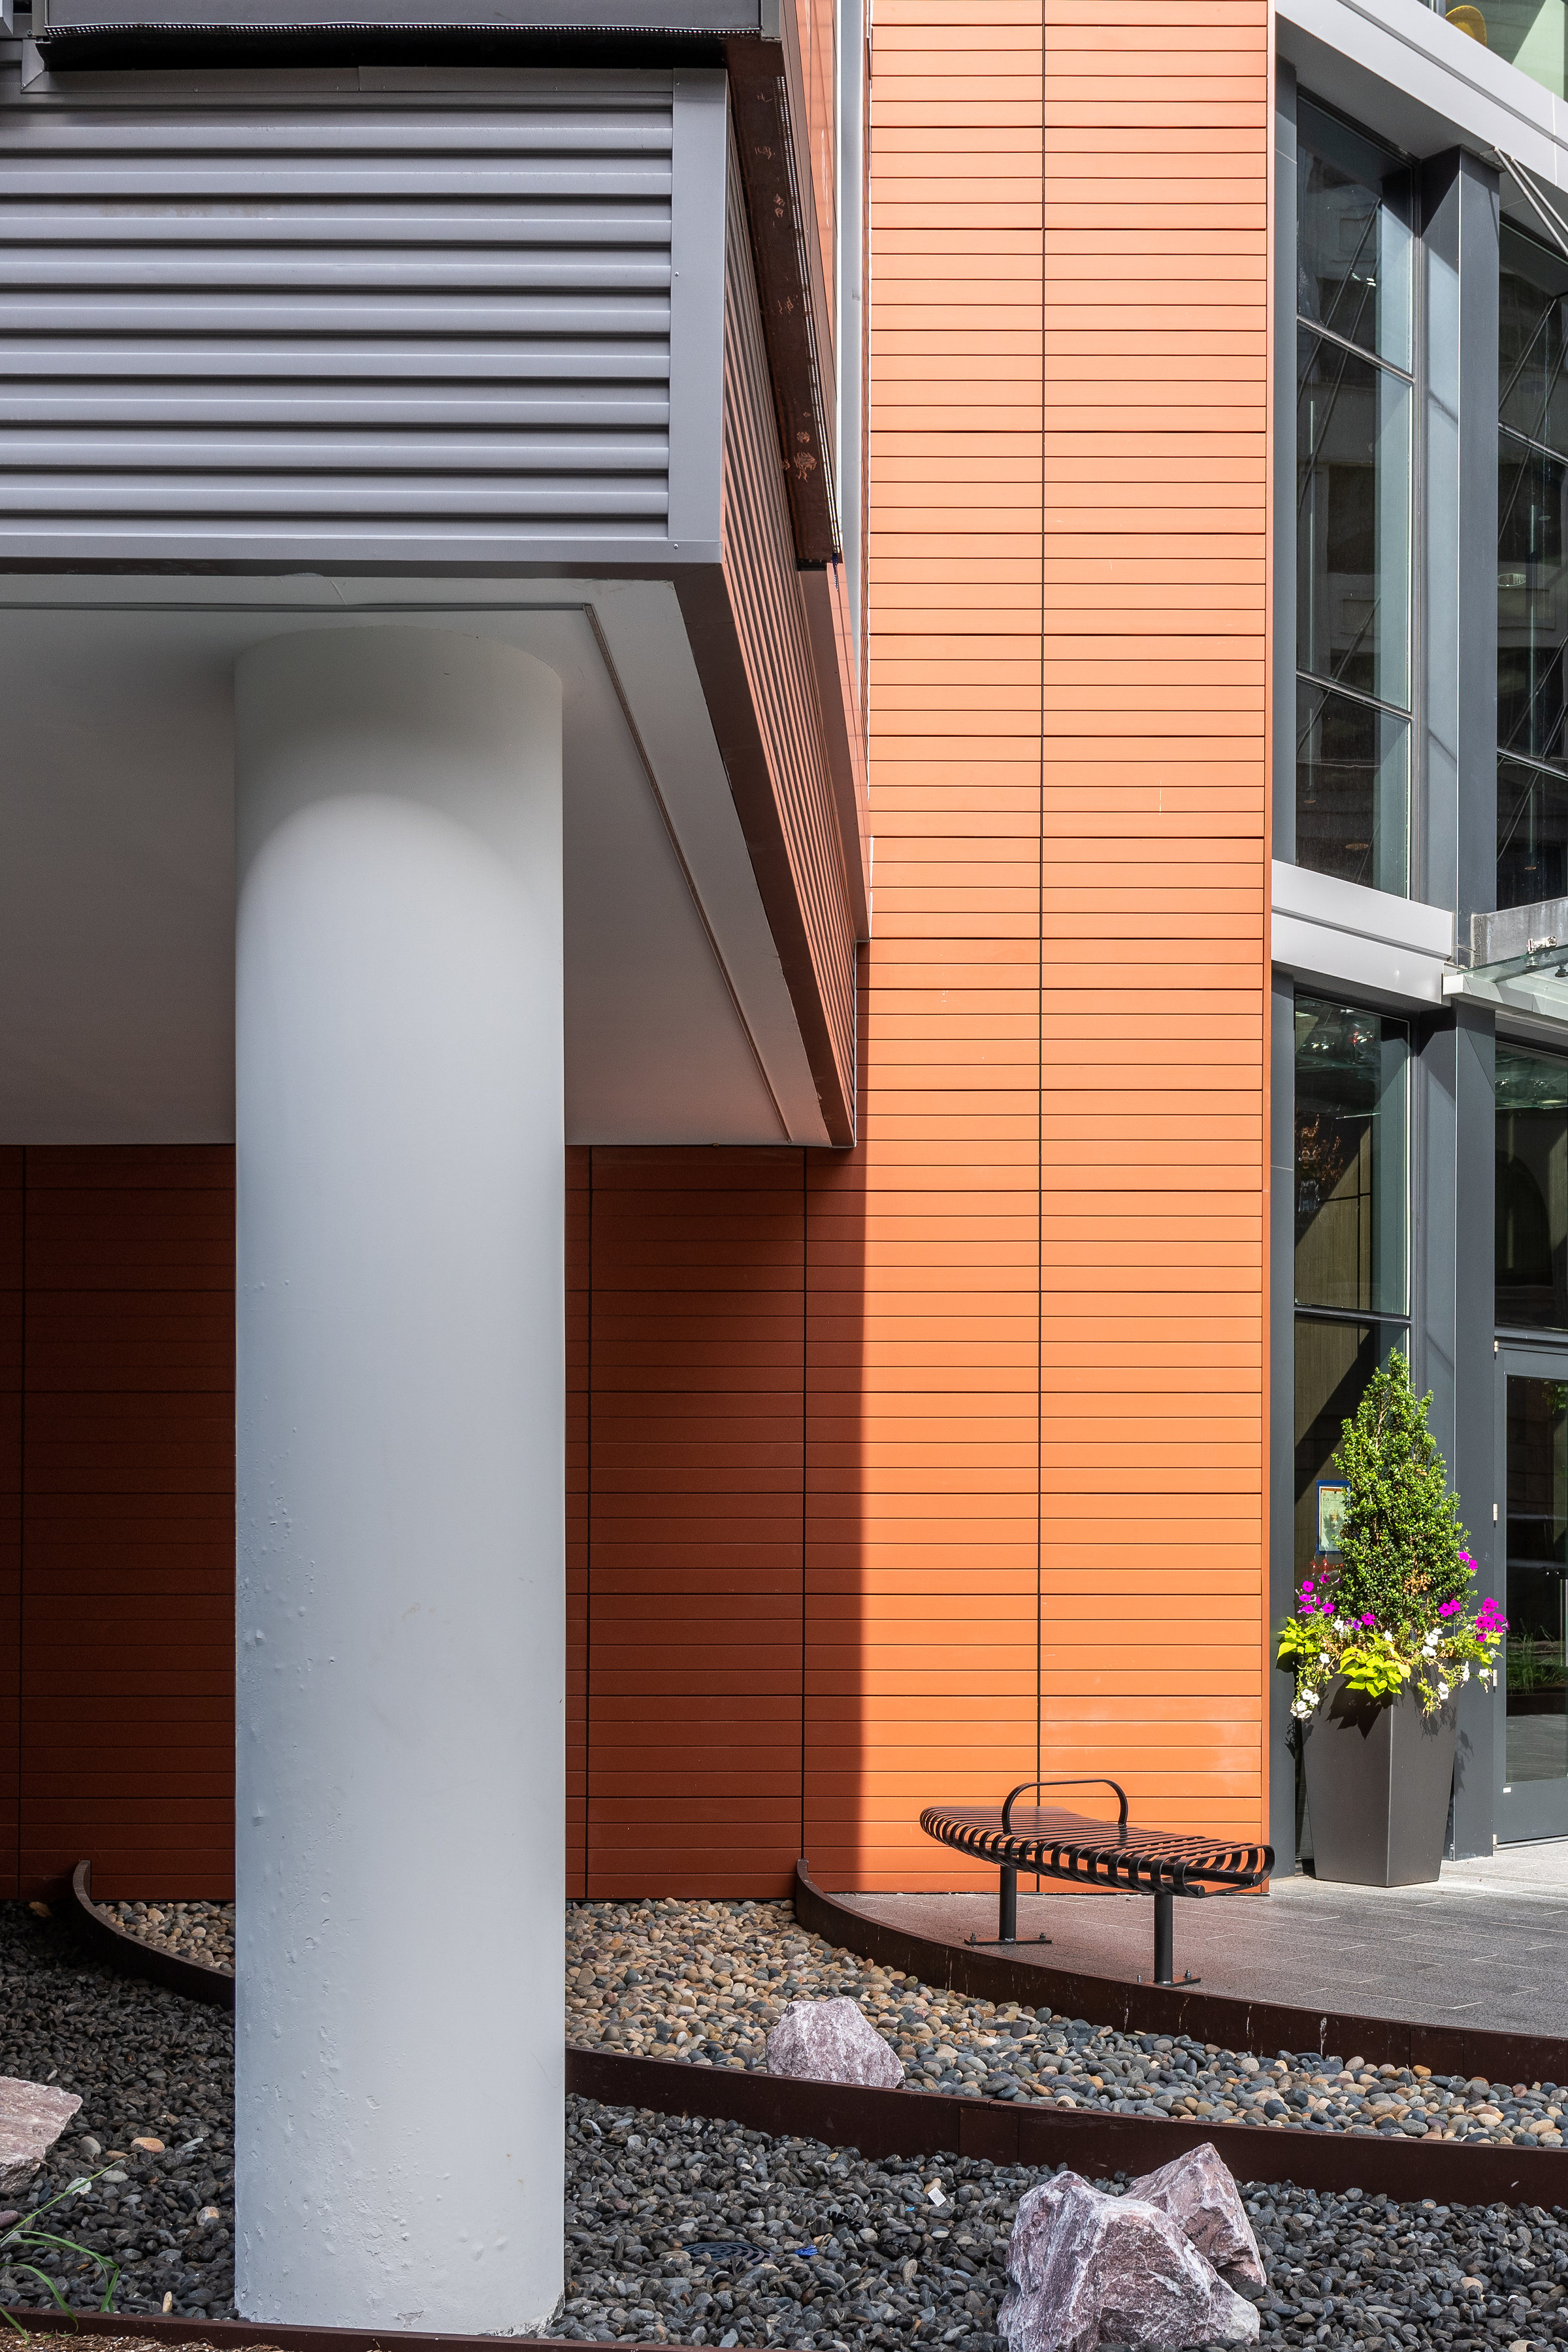 Terra5 TC18 Grooved Tiles MTFA Architecture Washington DC Rainscreen Cladding